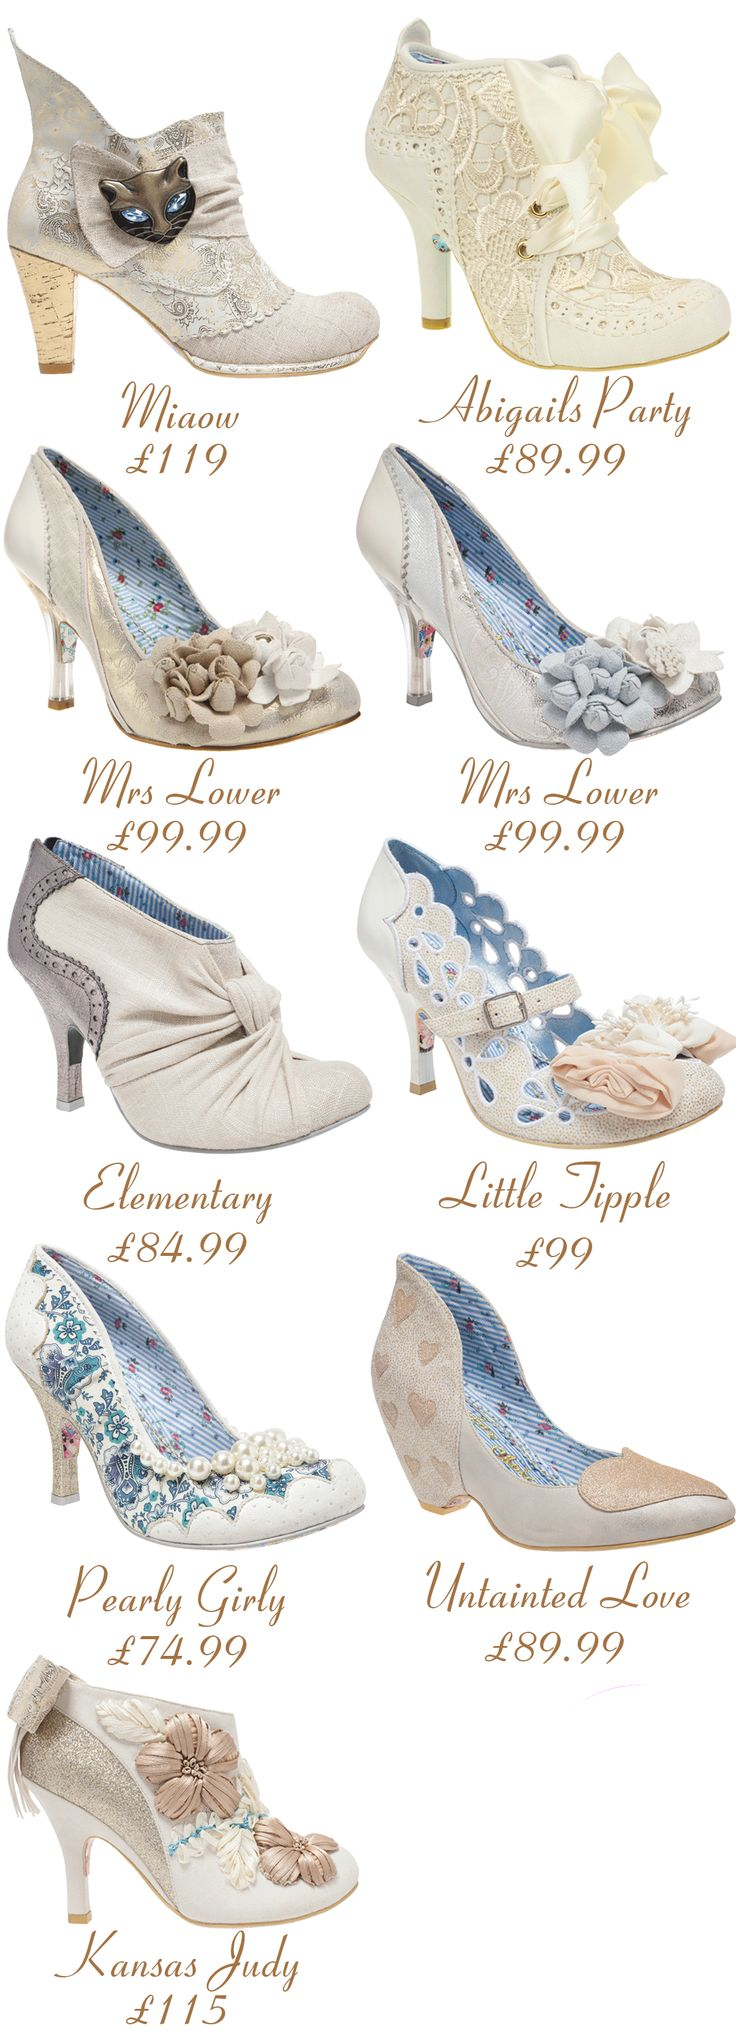 AW14-Irregular-Choice-Wedding-Shoes-Collection-